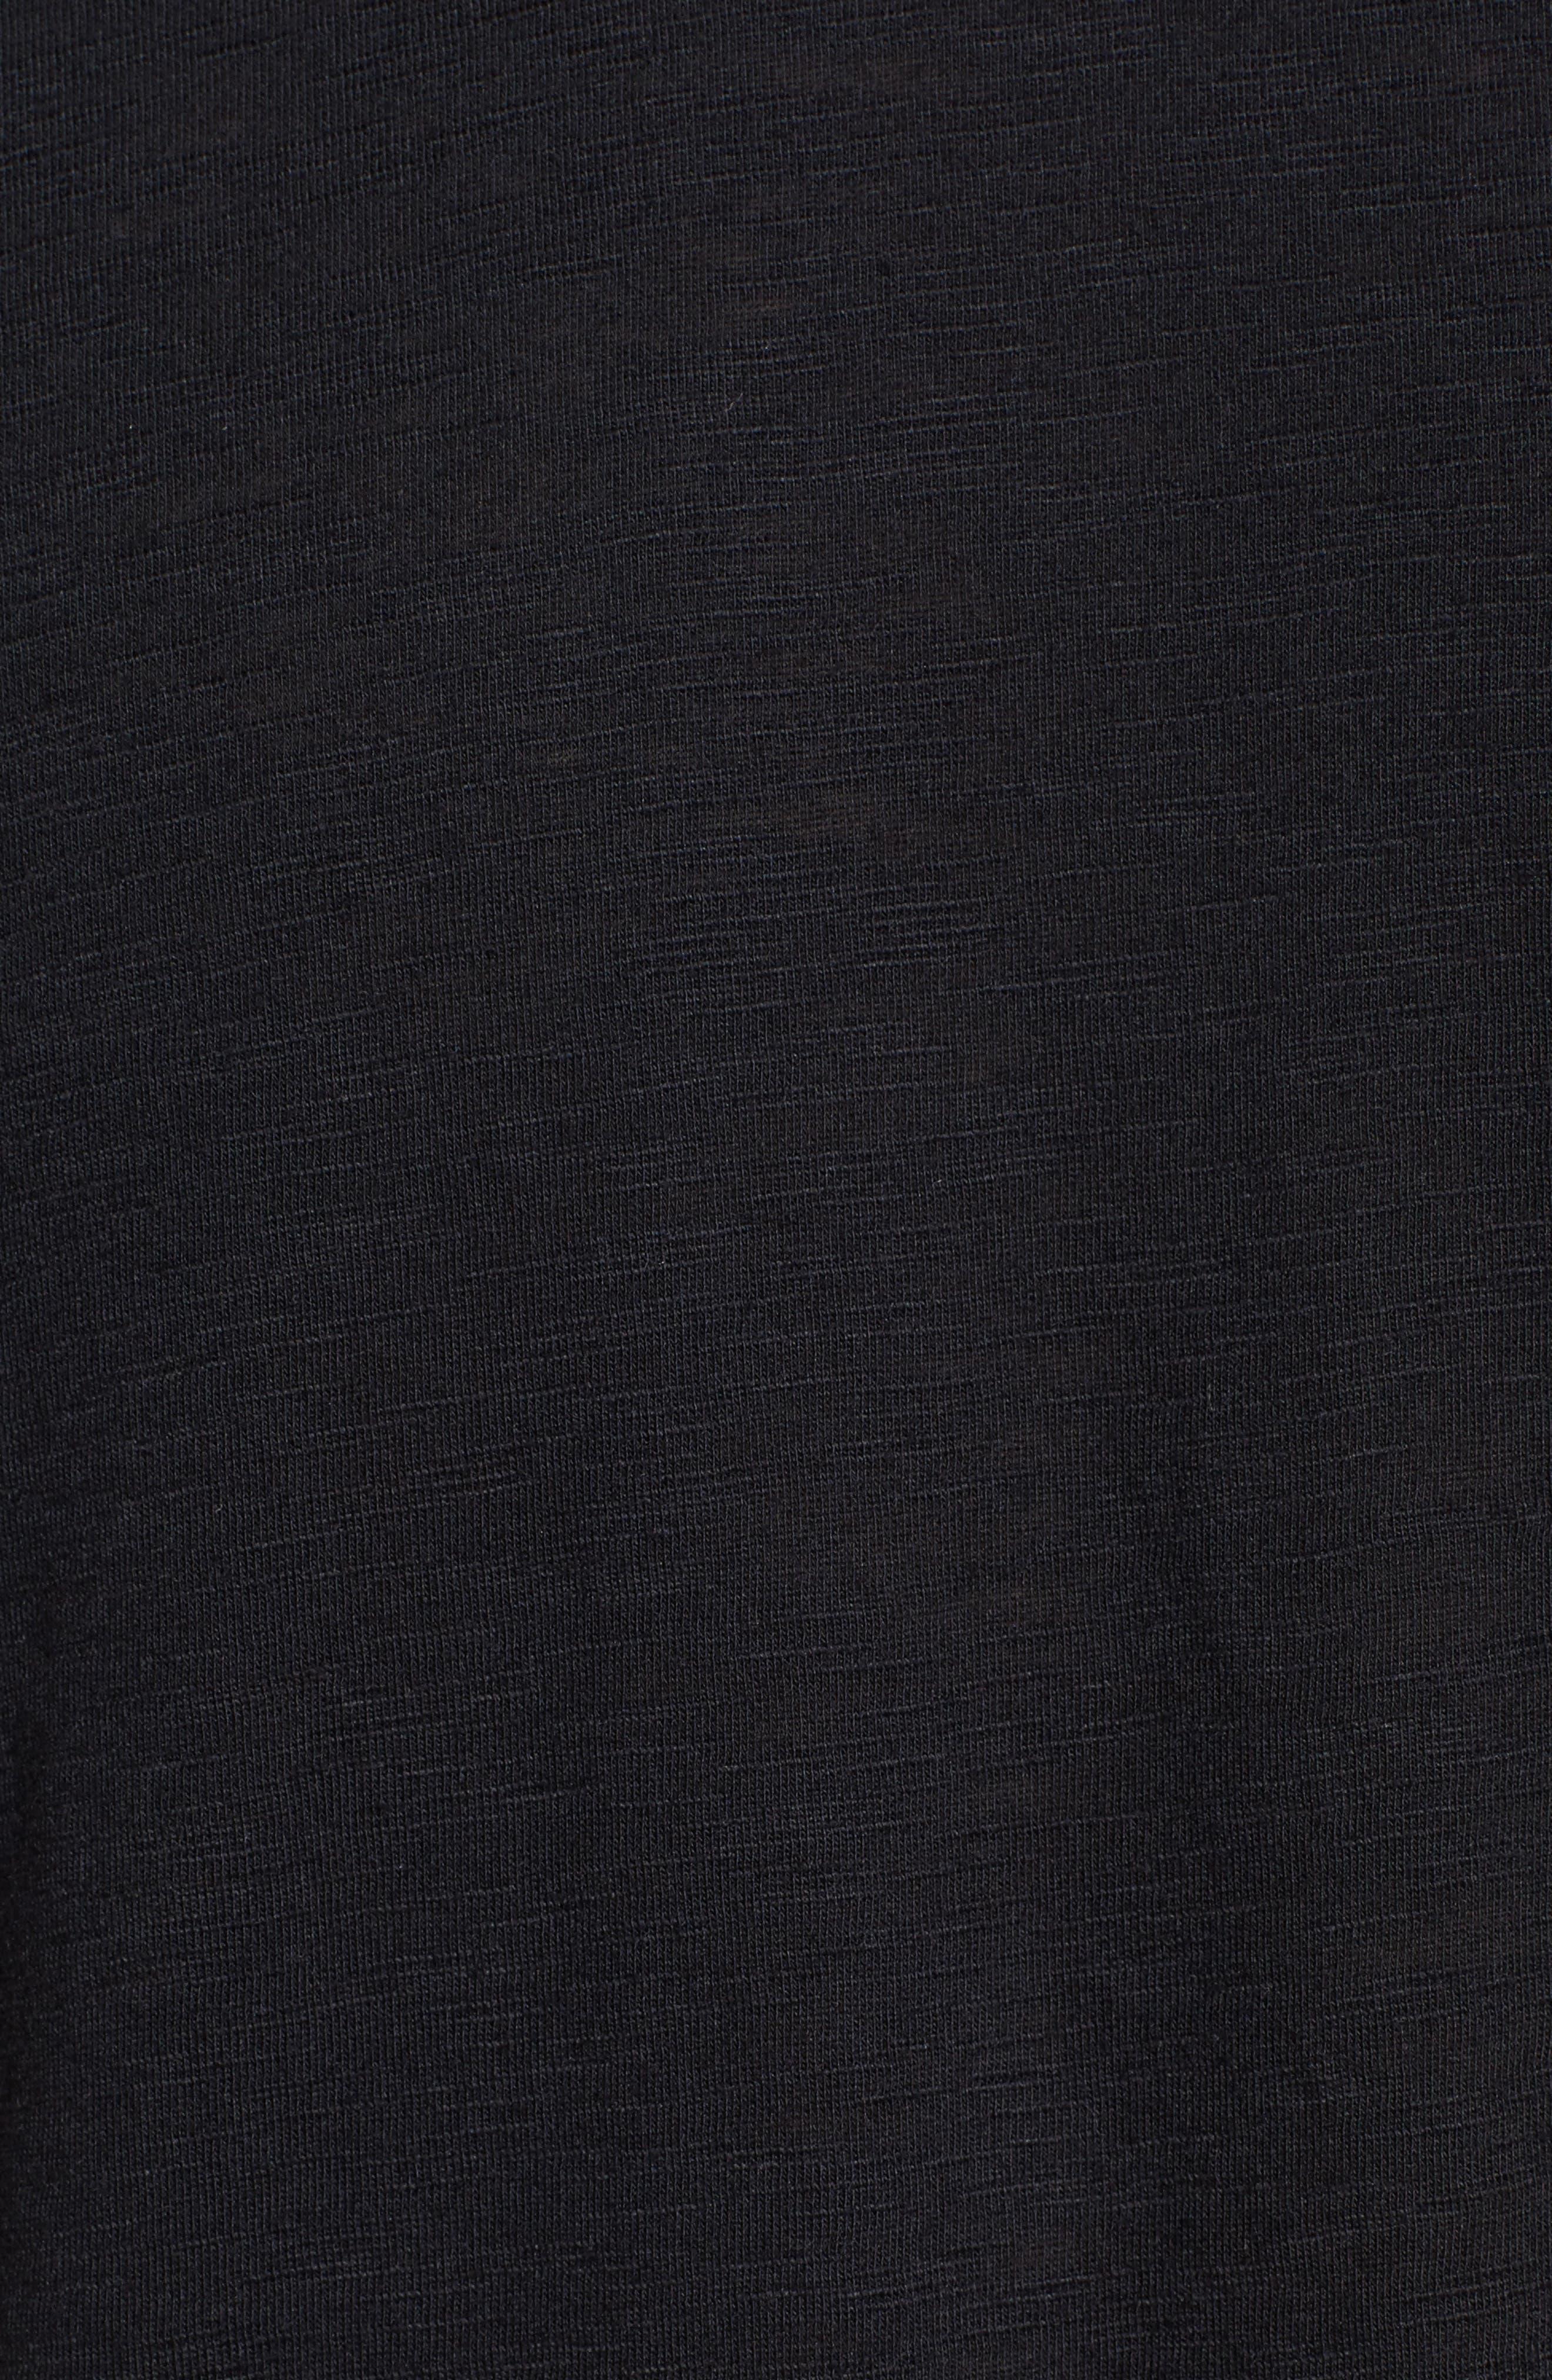 Apel Print Pocket T-Shirt,                             Alternate thumbnail 5, color,                             001